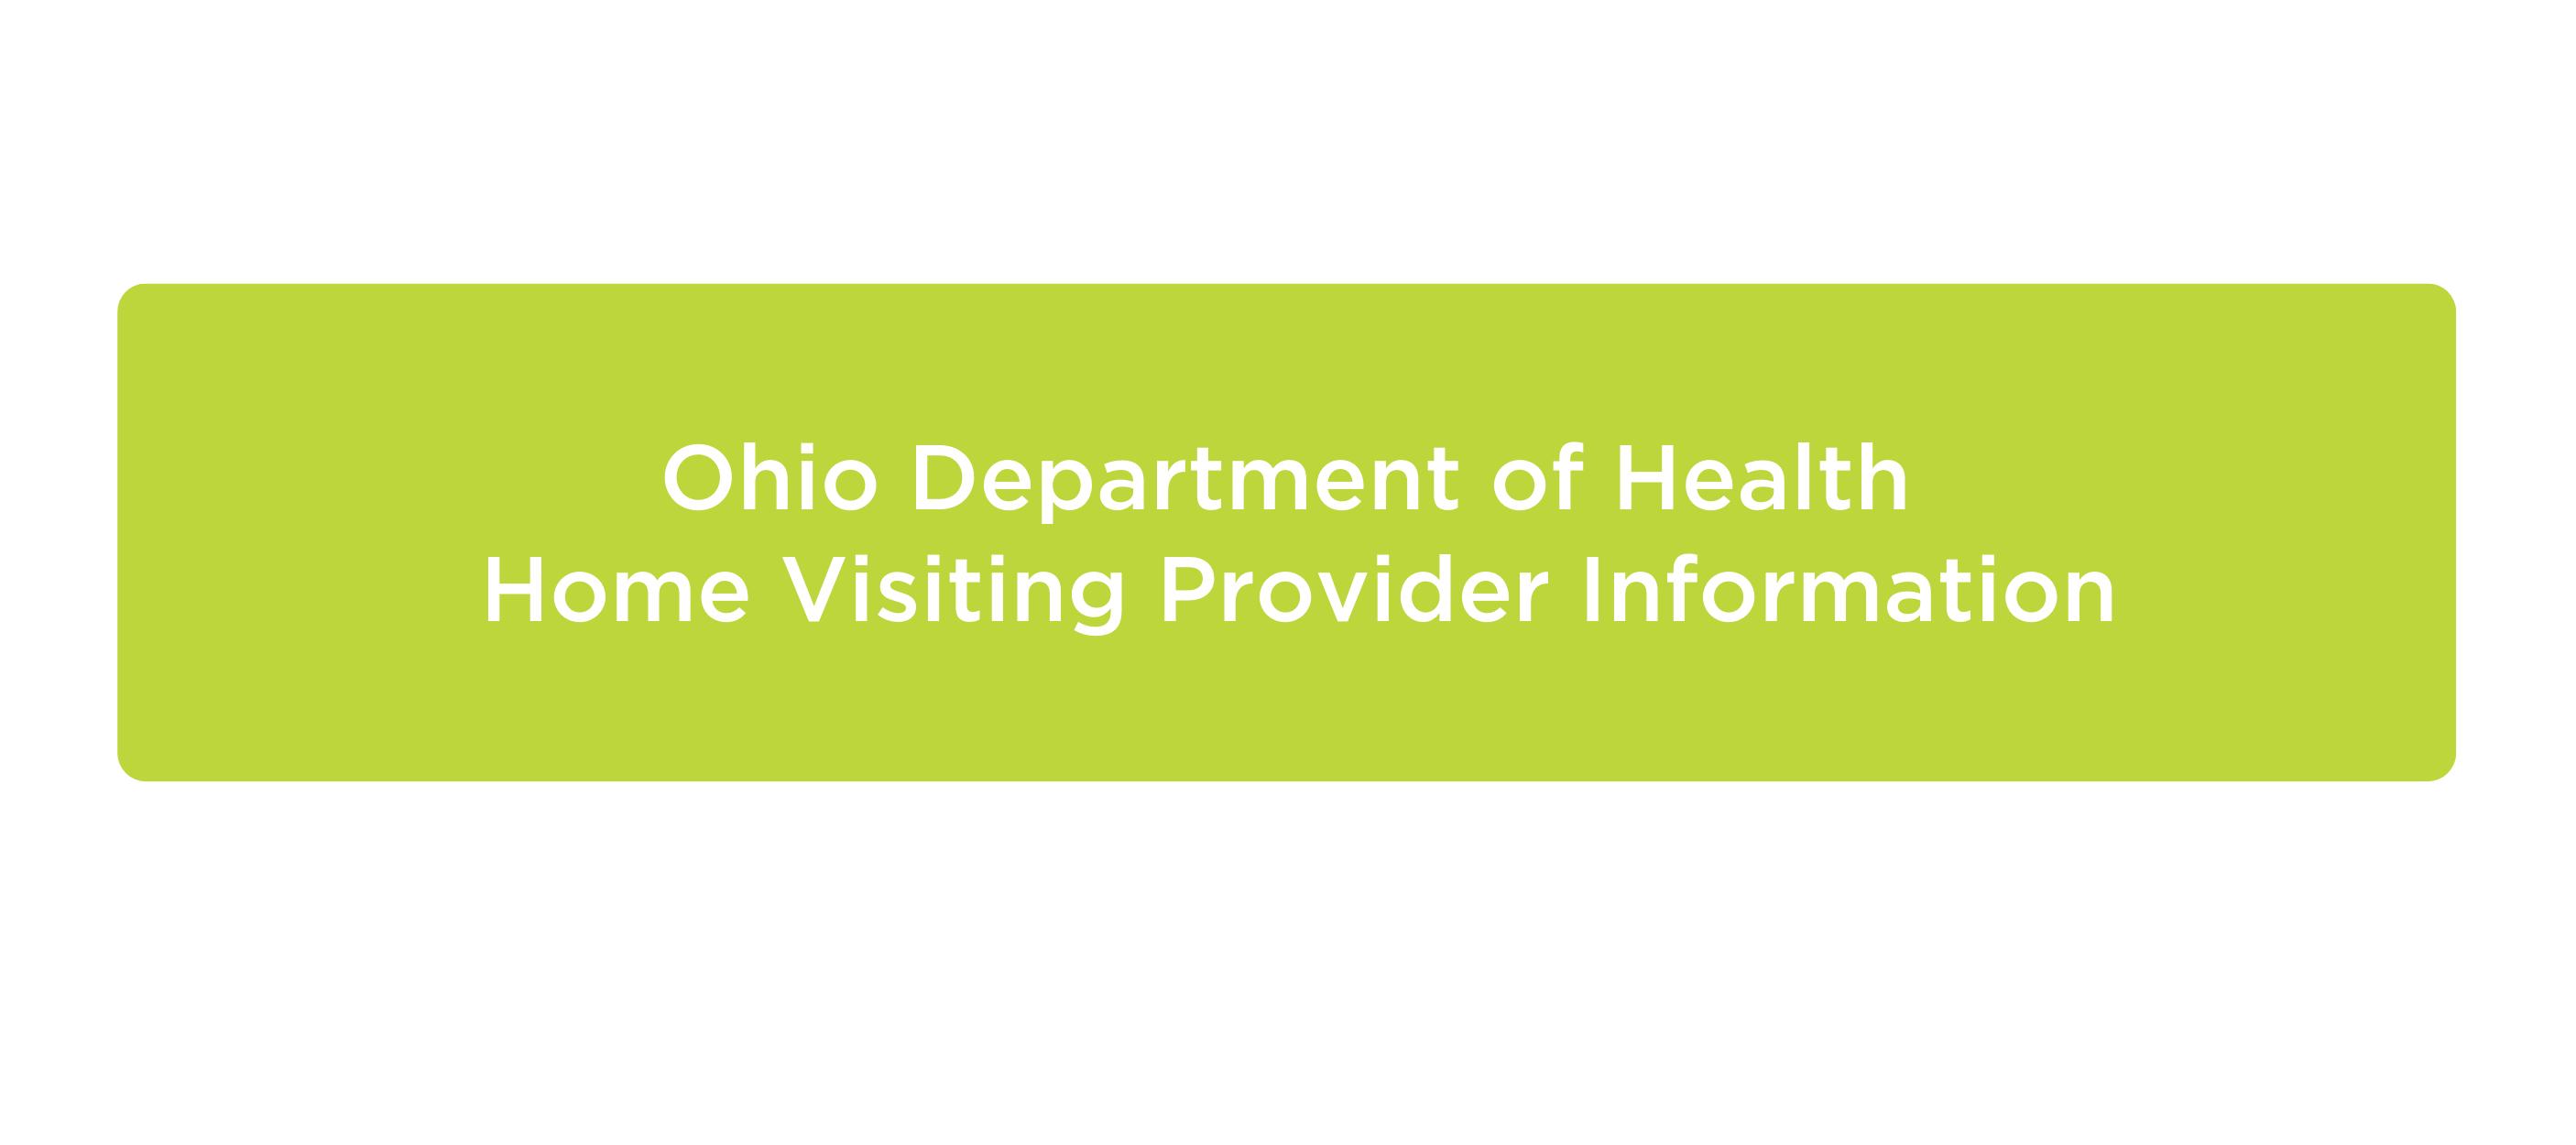 Ohio Department of Health provider information